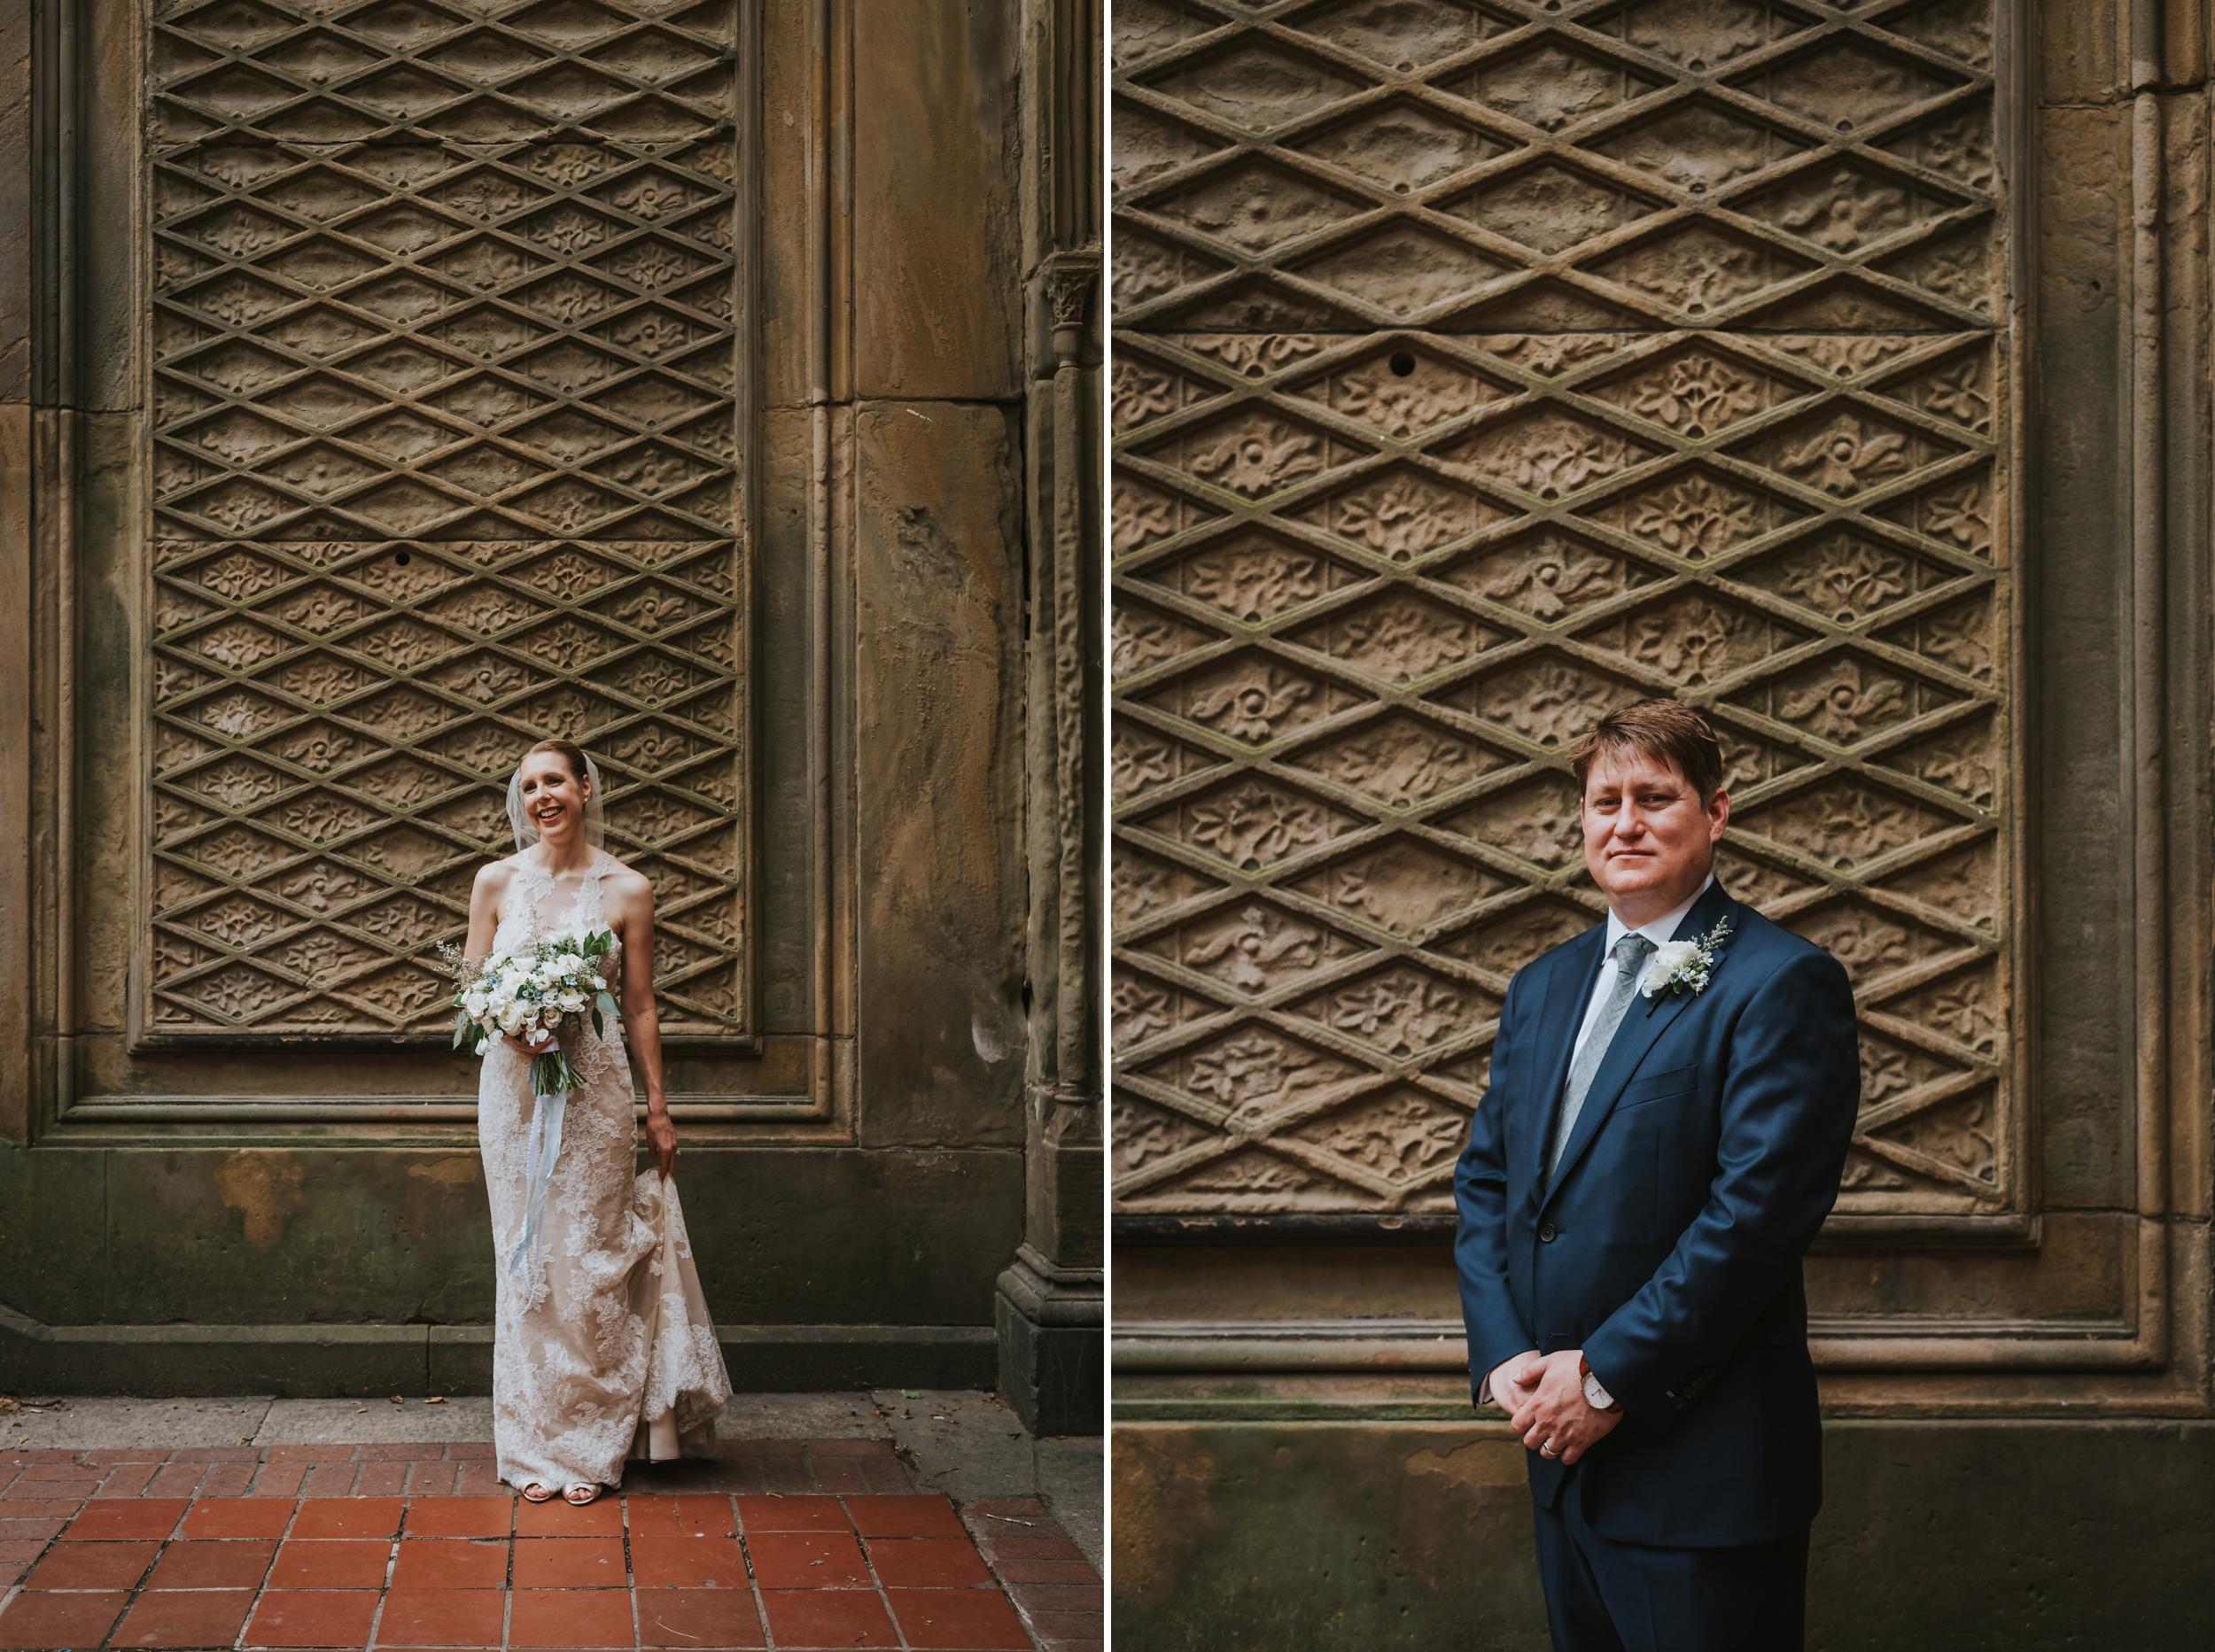 Rebecca & Matt Ladies Pavilion Central Park Elopement NYC Wandermore Photography (35).jpg